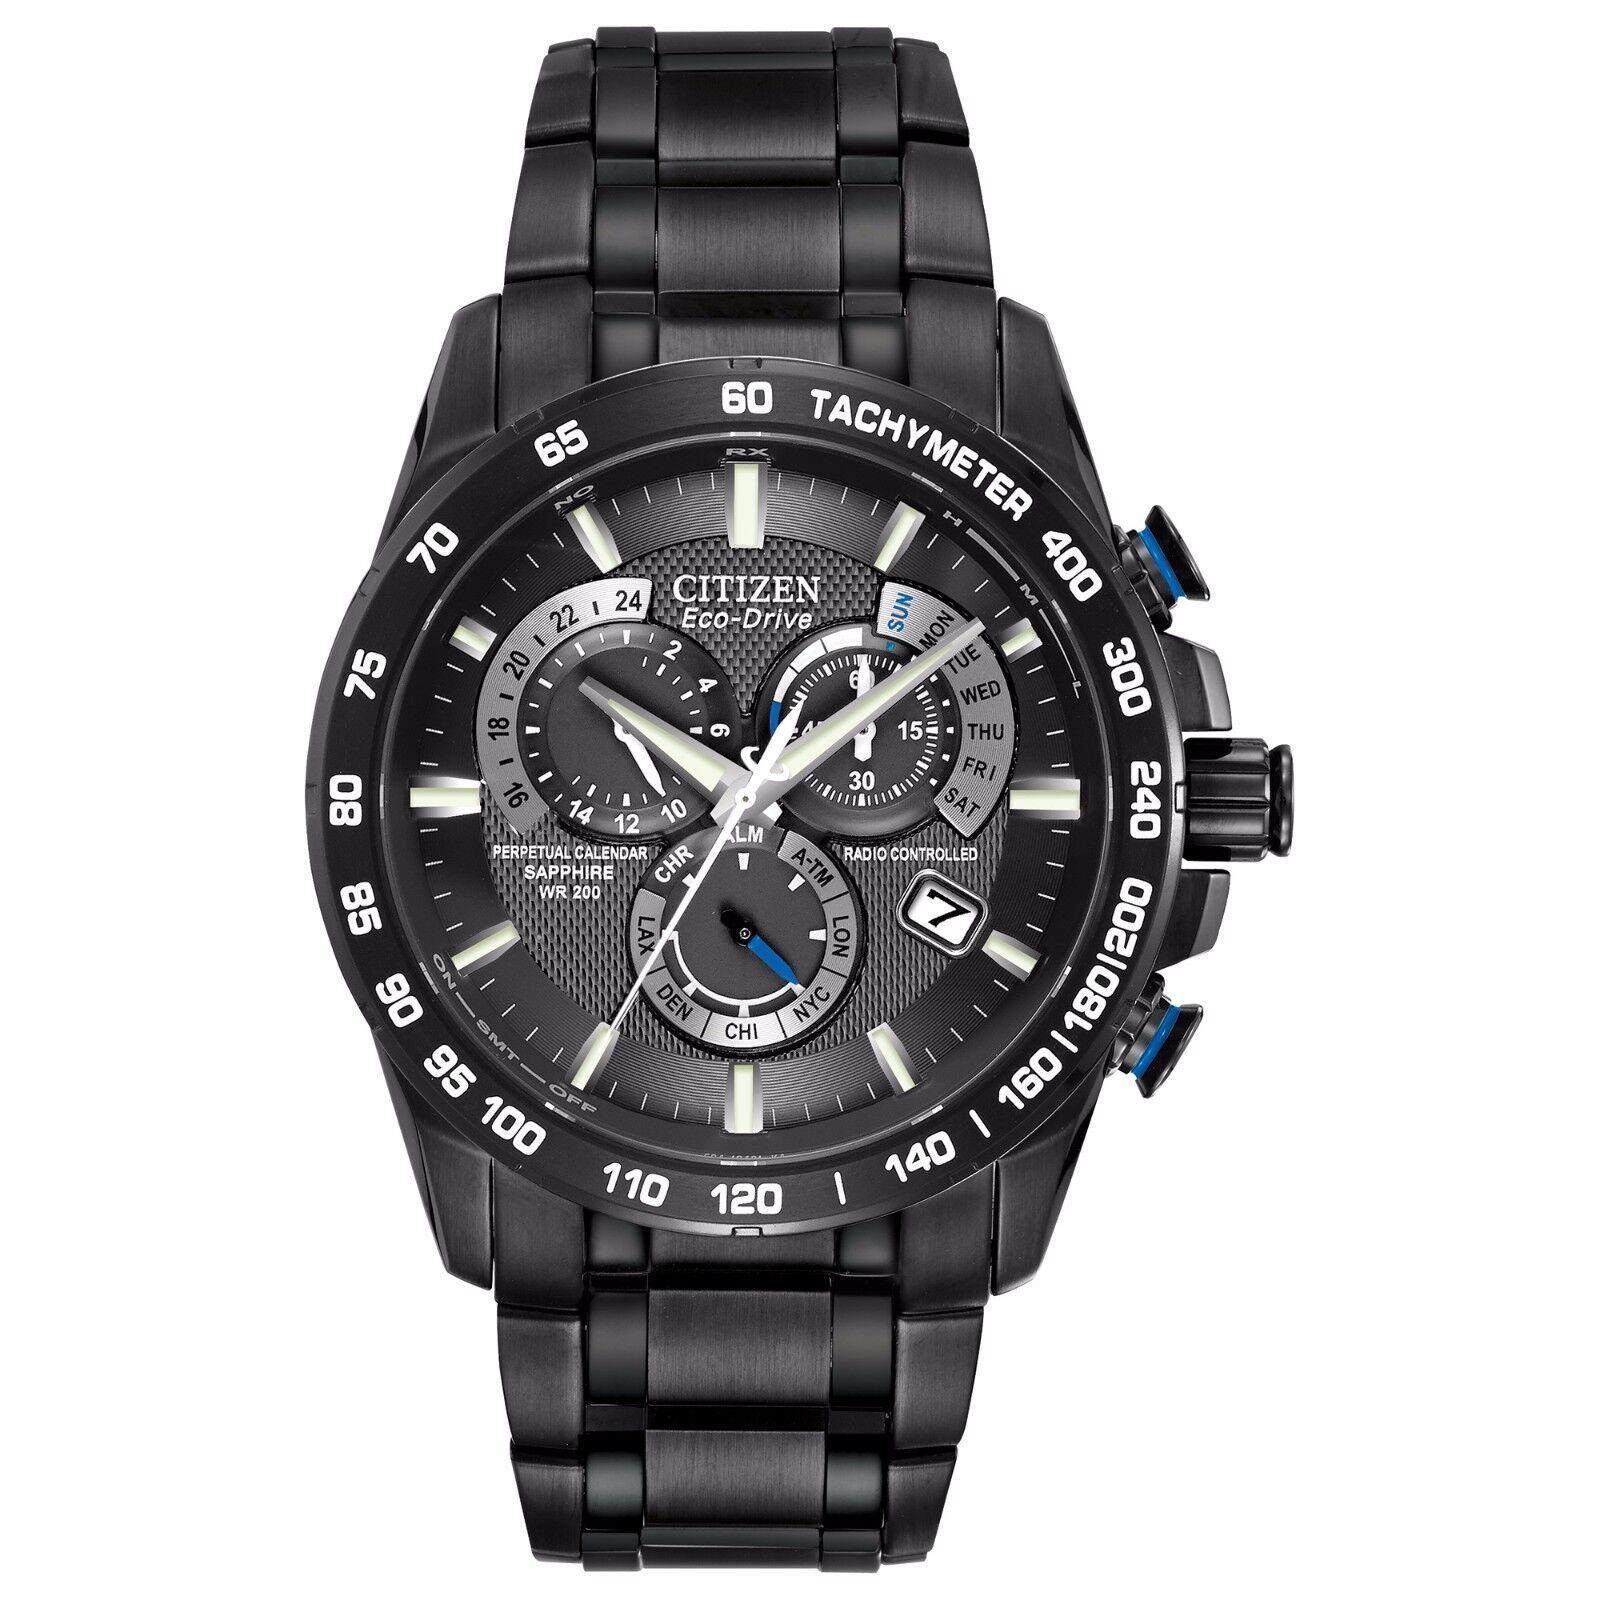 $179.99 - Citizen Eco-Drive Men's AT4007-54E Chronograph Perpetual Calendar 42mm Black